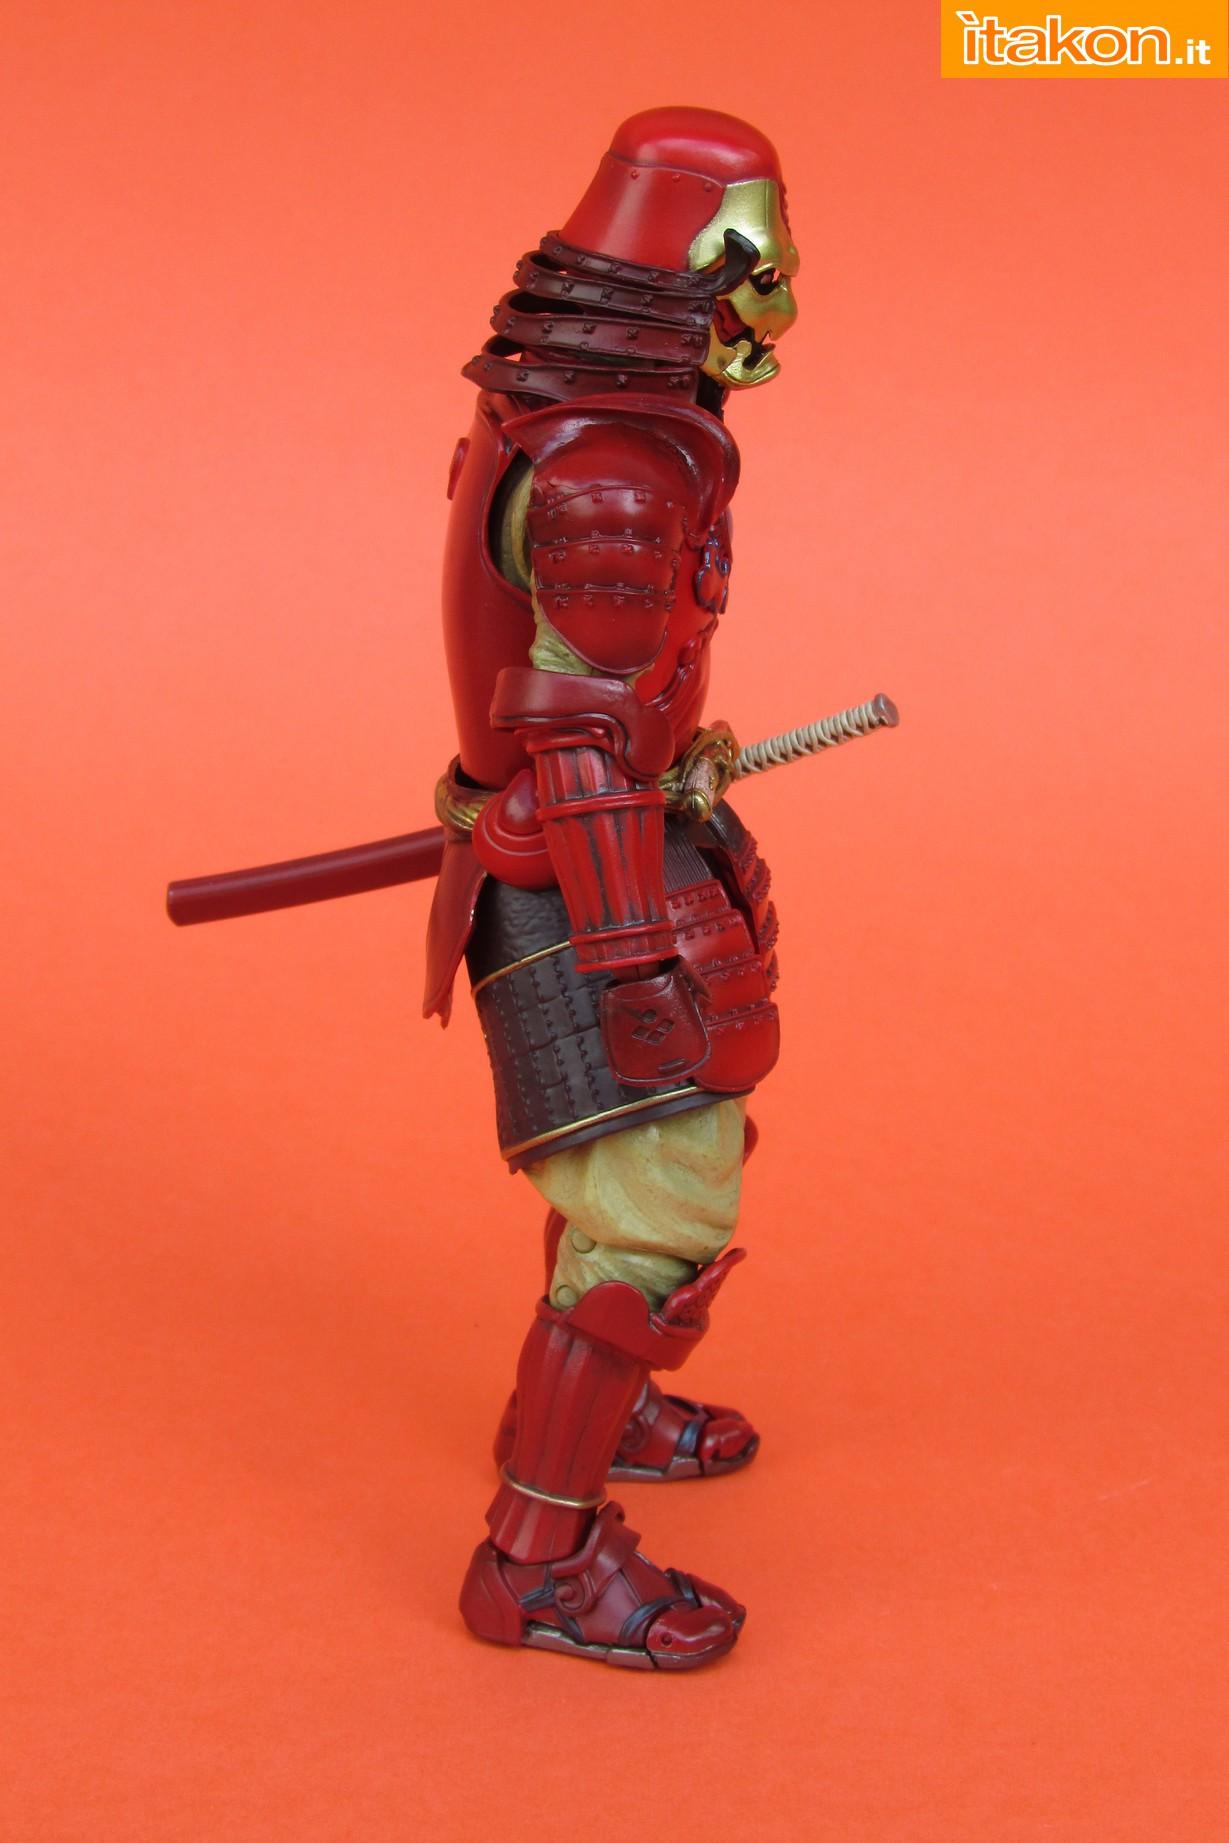 Link a Marvel Comics Koutetsu Samurai Iron Man Mark 3 Meishou MANGA REALIZATION review Bandai Itakon.it14